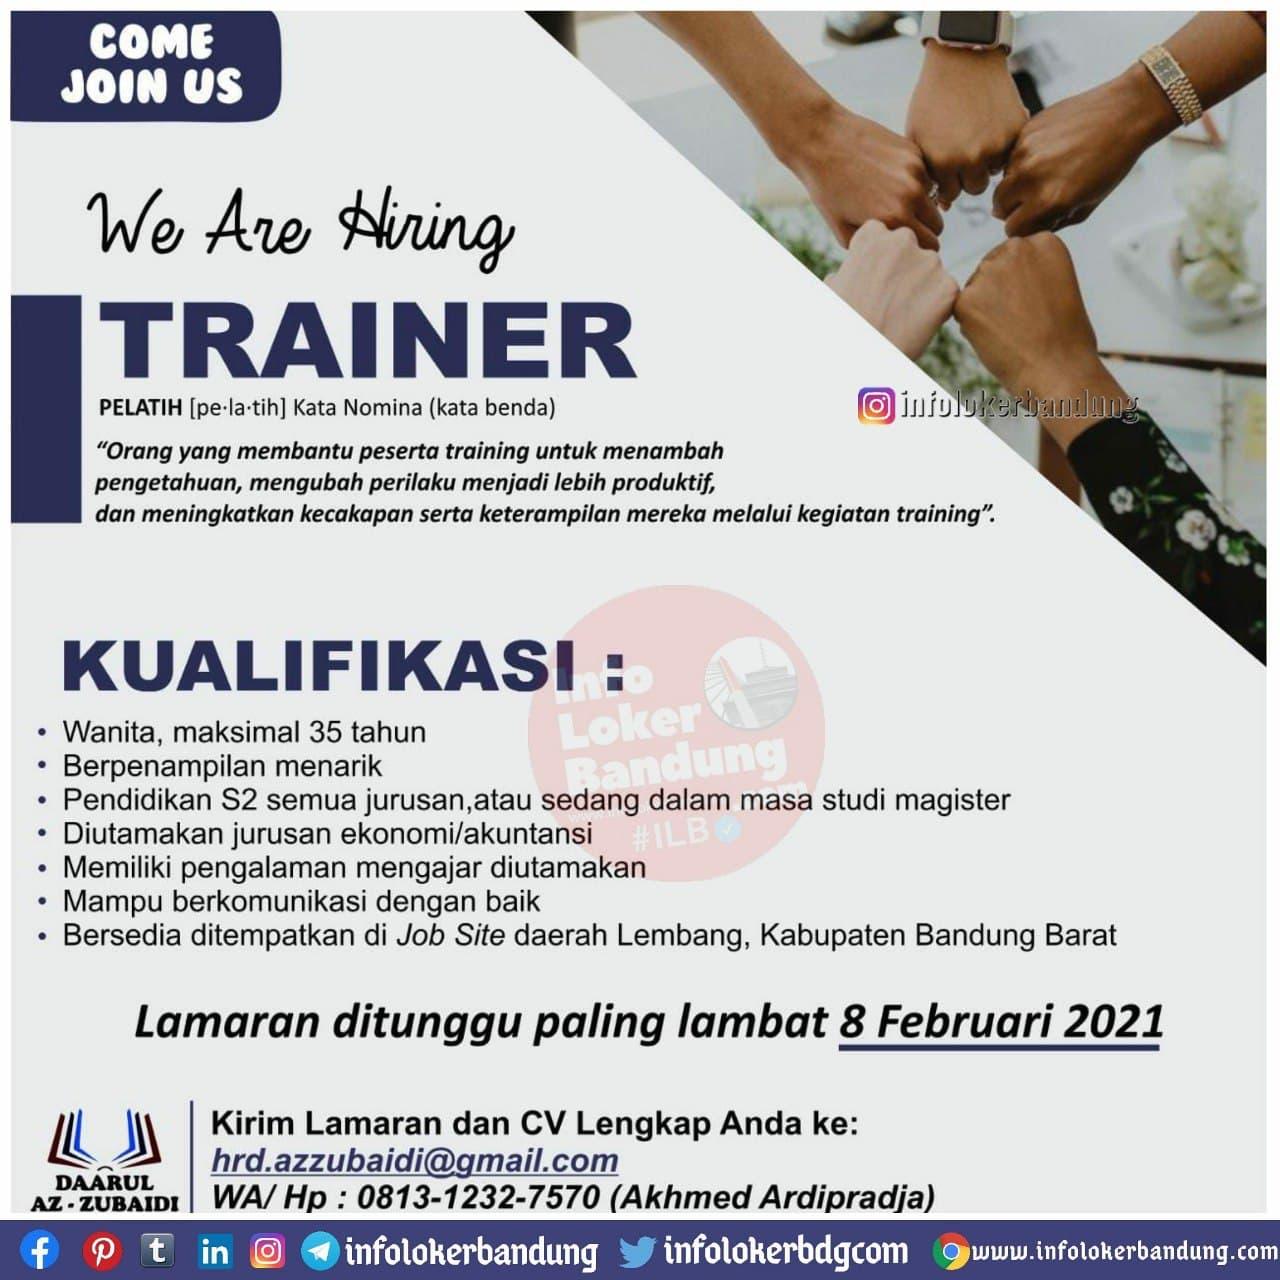 Lowongan Kerja Trainer Daarul Az-Zubaidi Lembang Bandung Januari 2021